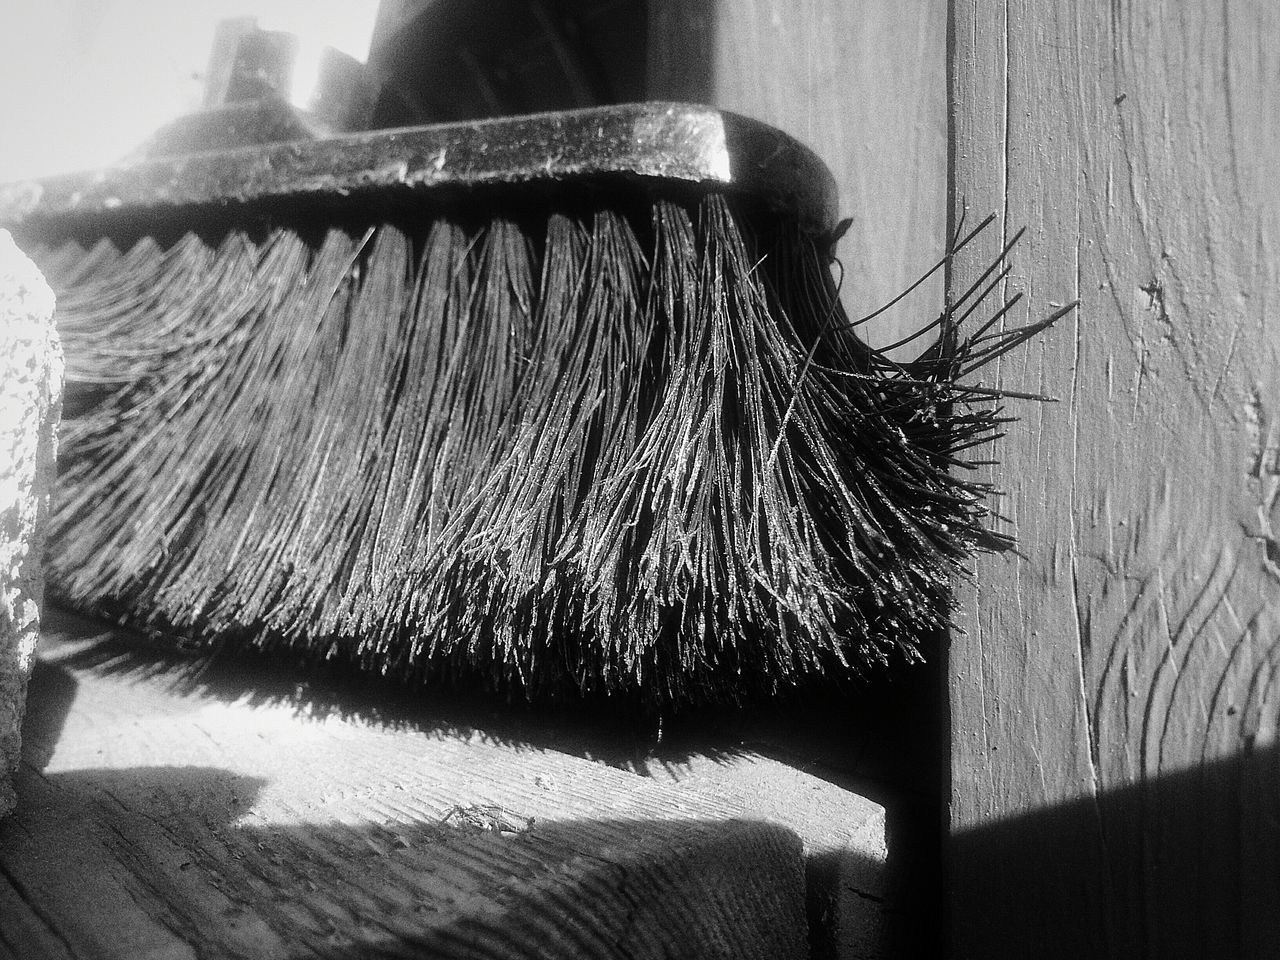 Close-Up Of Broom At Home